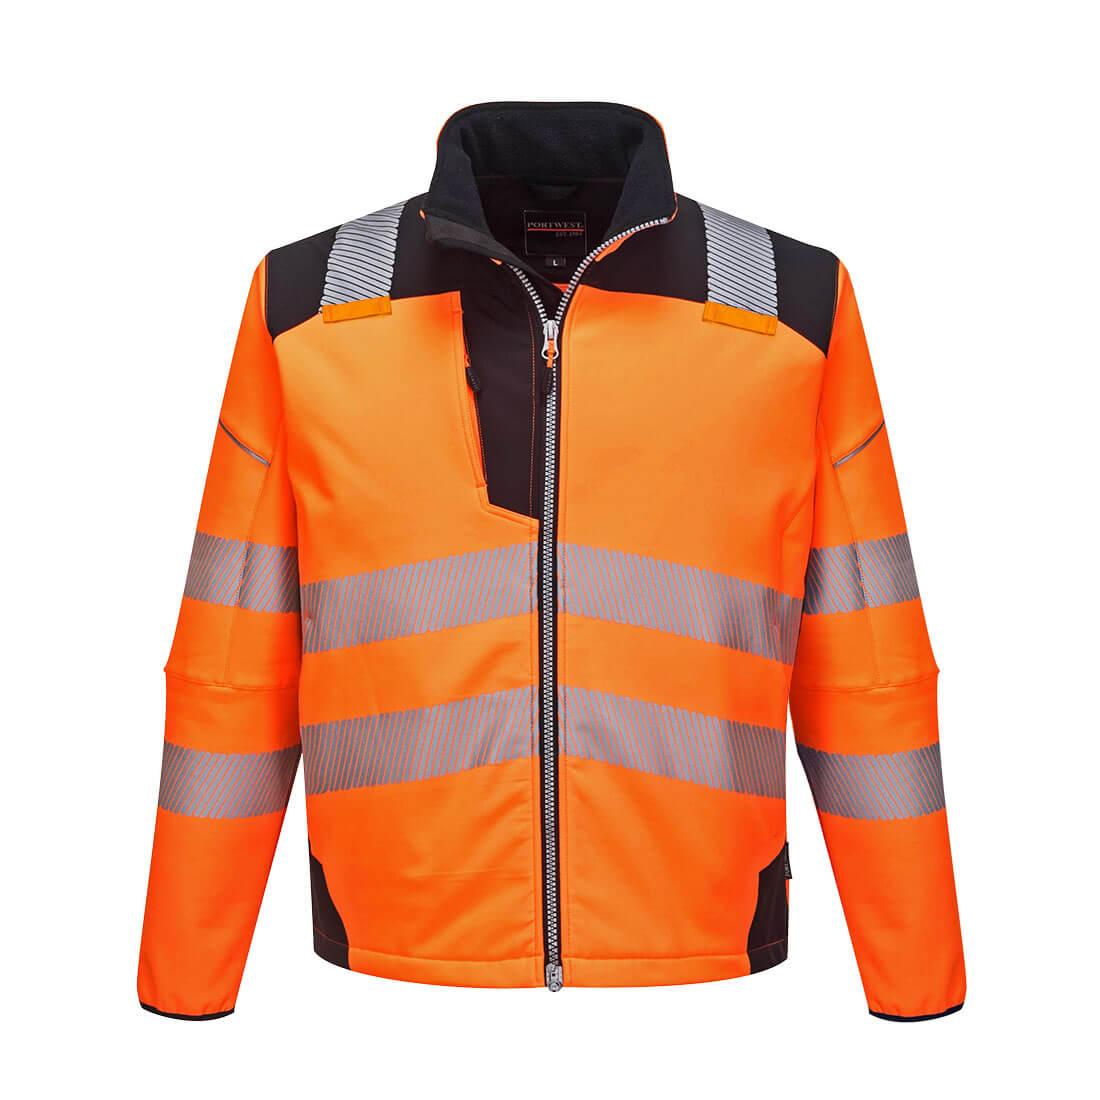 PW3 Hi-Vis Softshell Jacket Orange/Black XLR